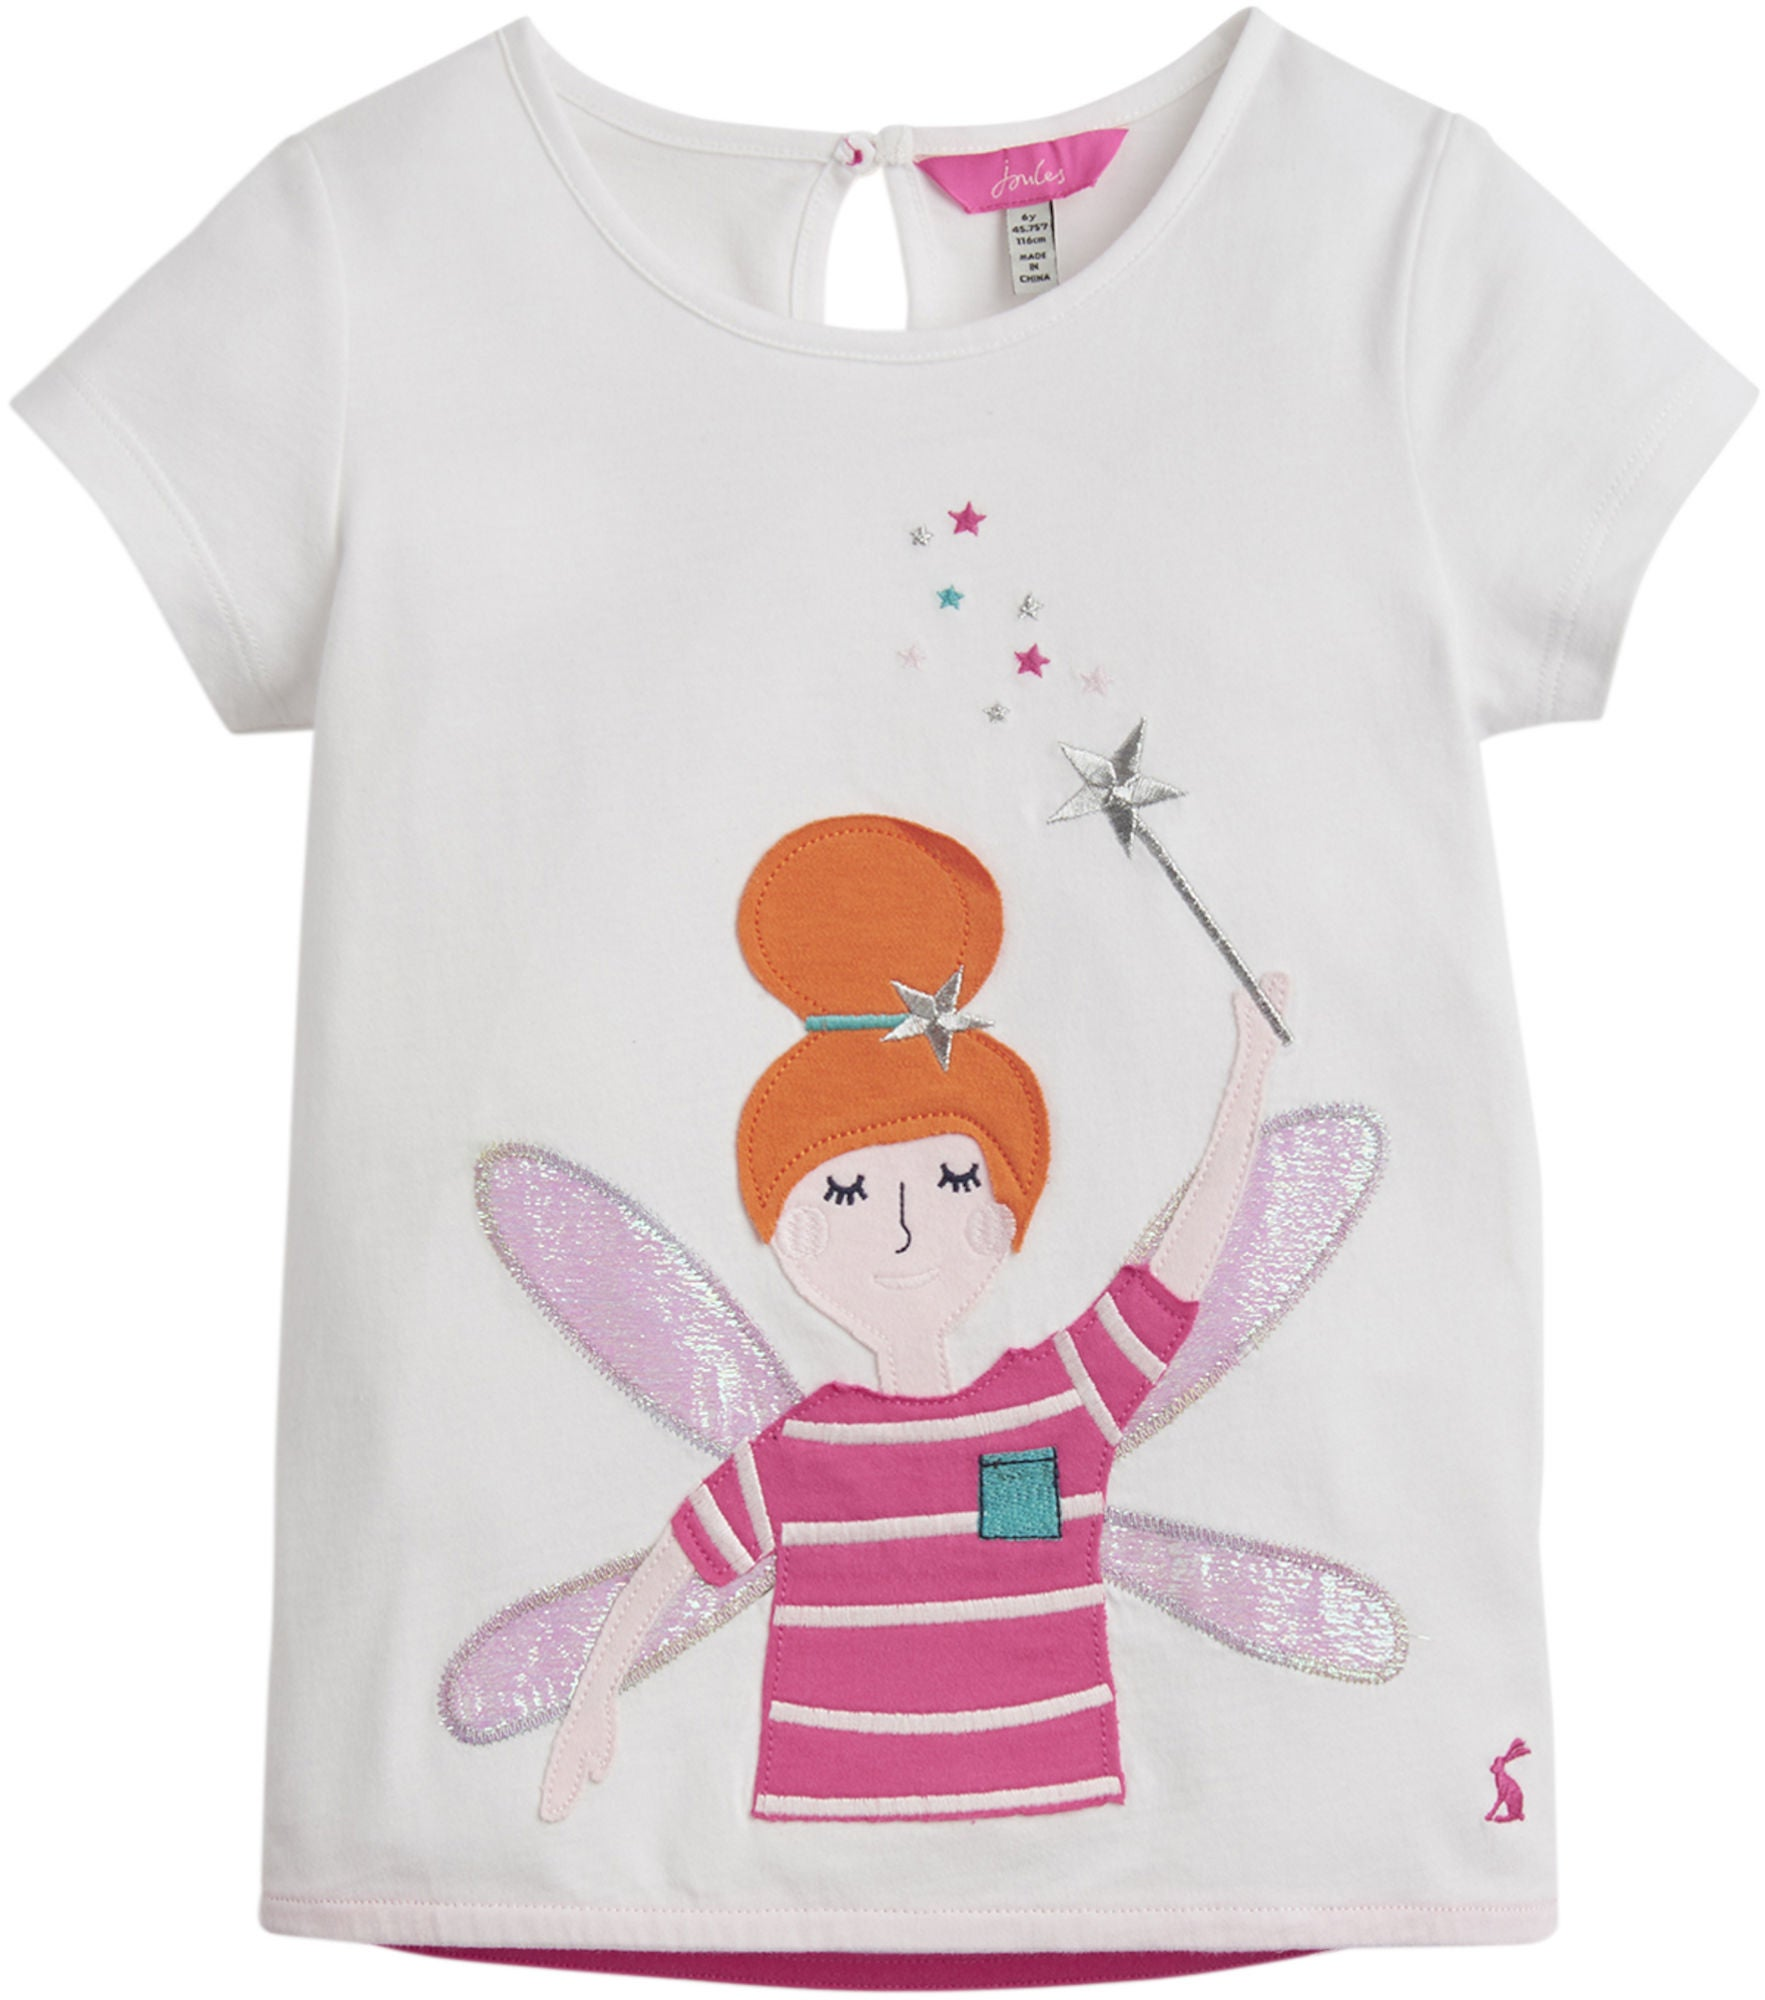 Tom Joule Applique T-Shirt, White Fairy 2 År